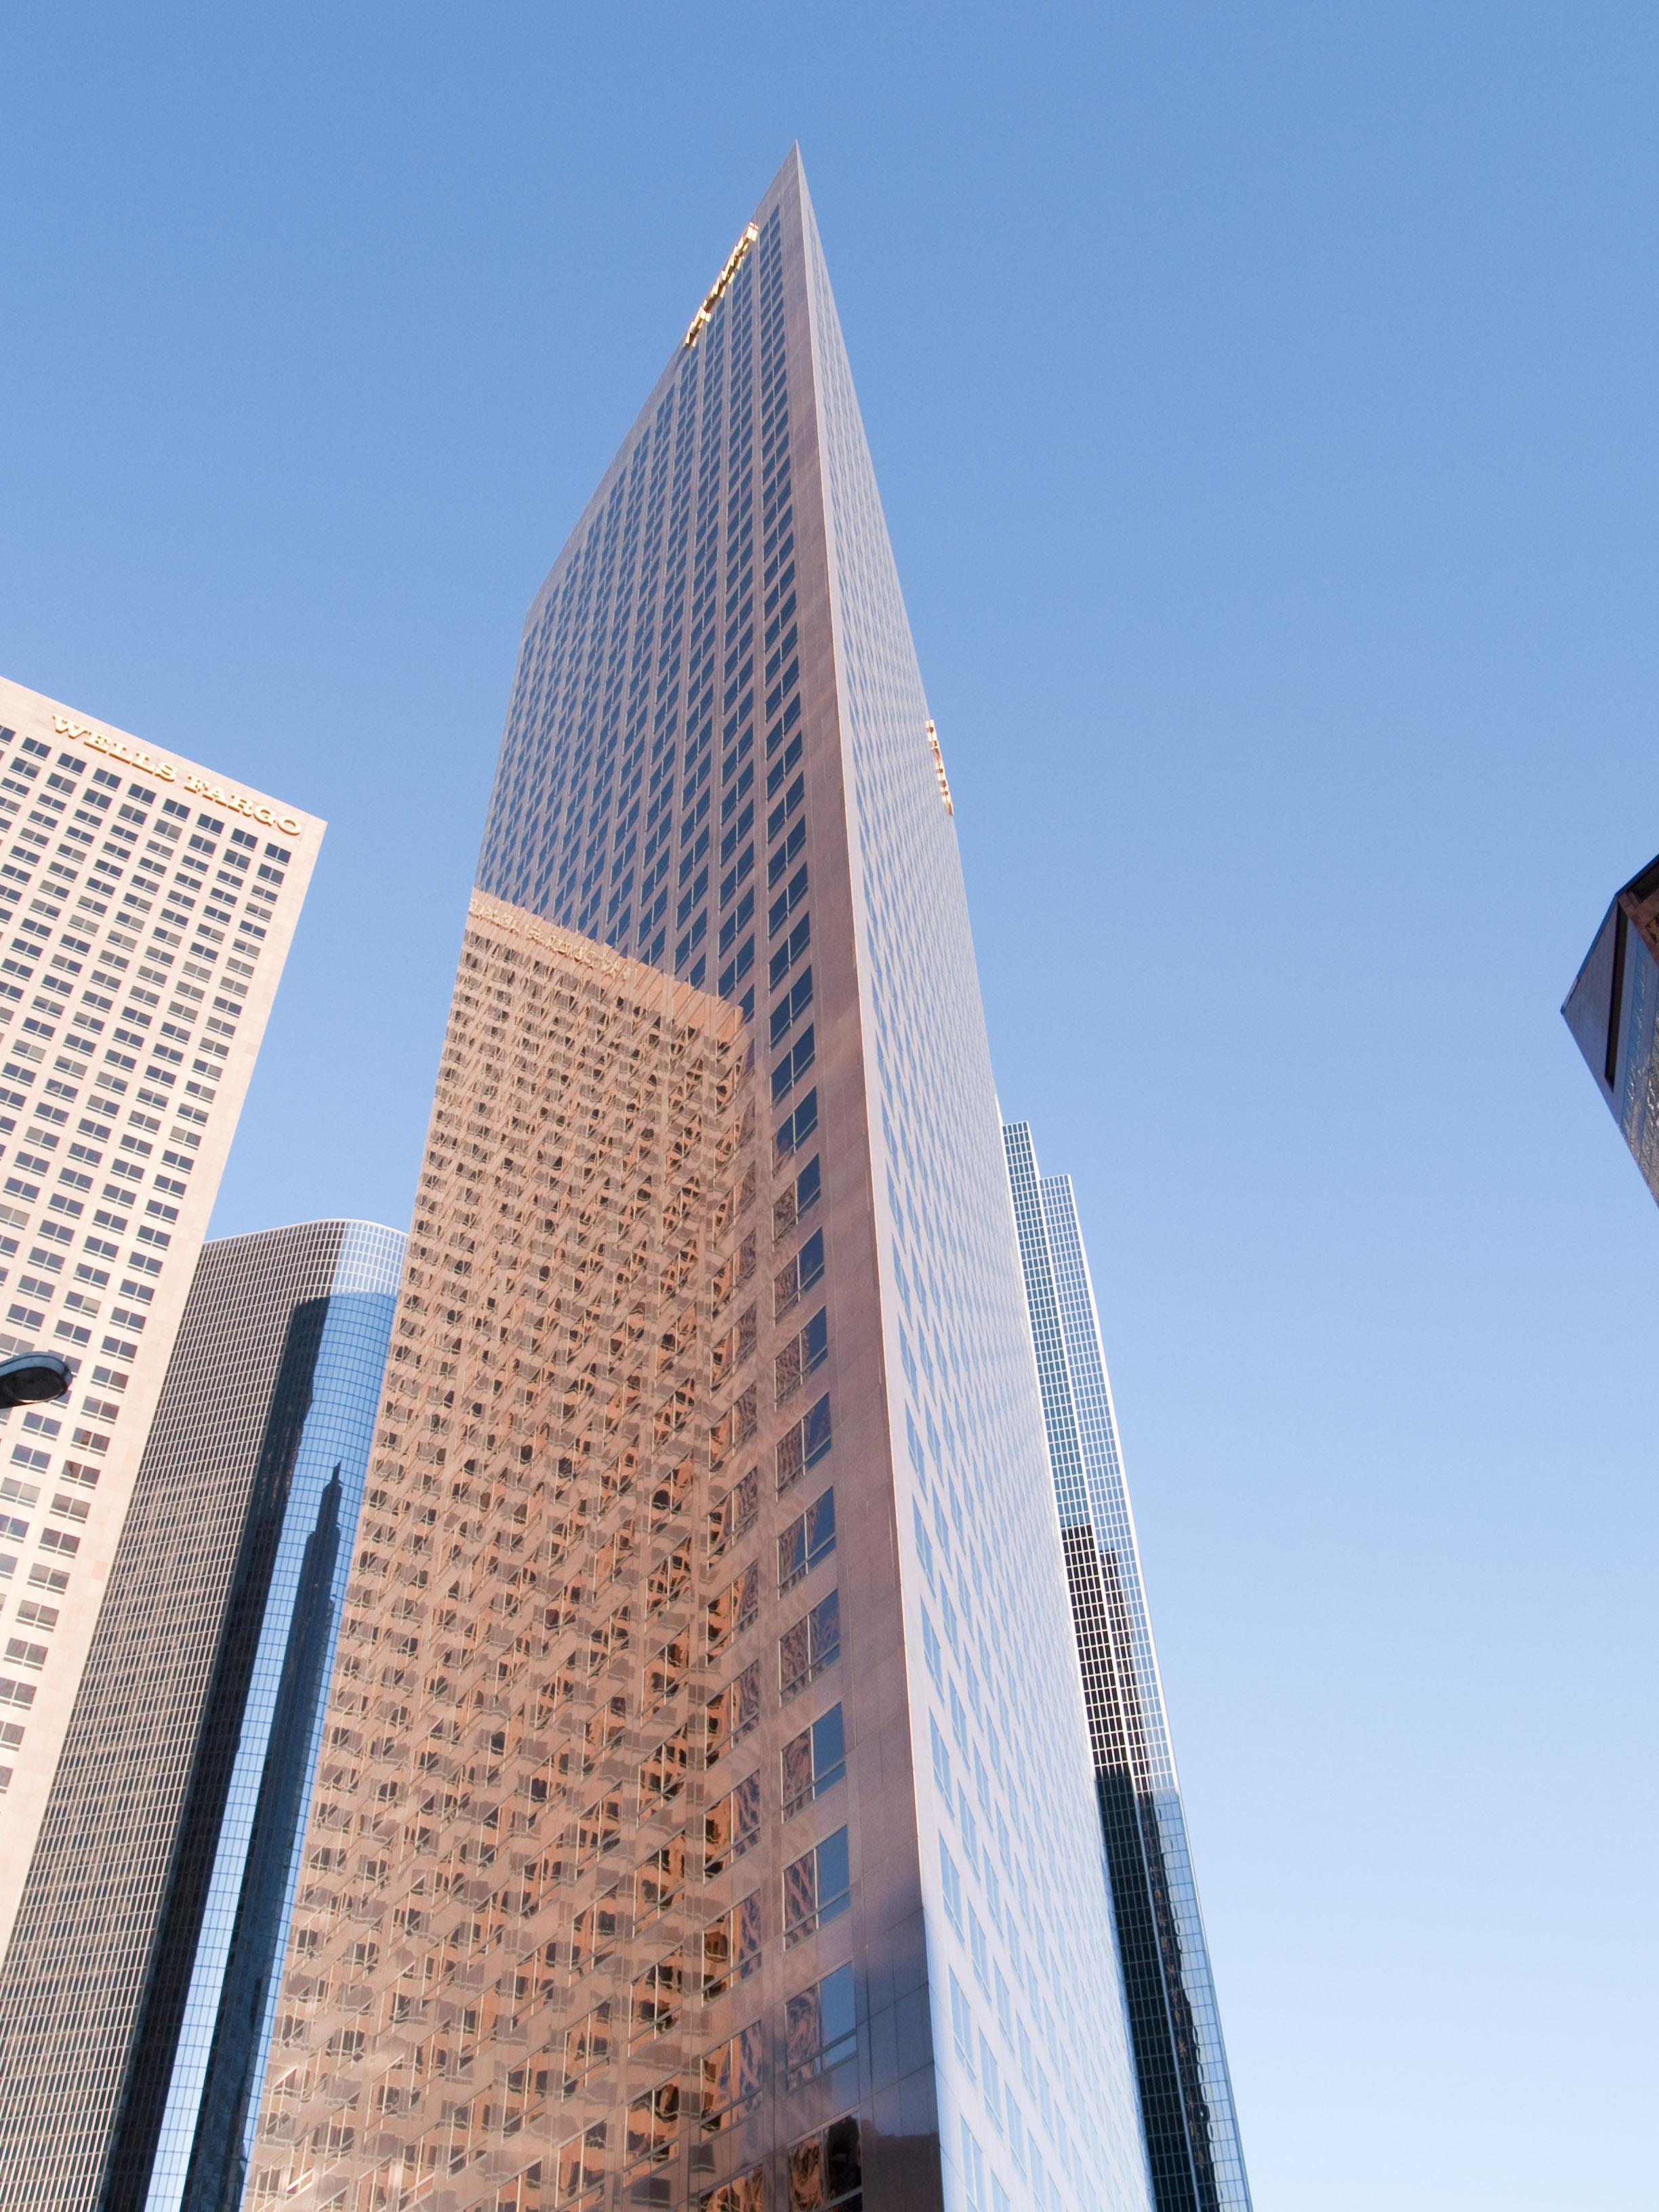 Archikey.com | Buildings | KPMG Tower